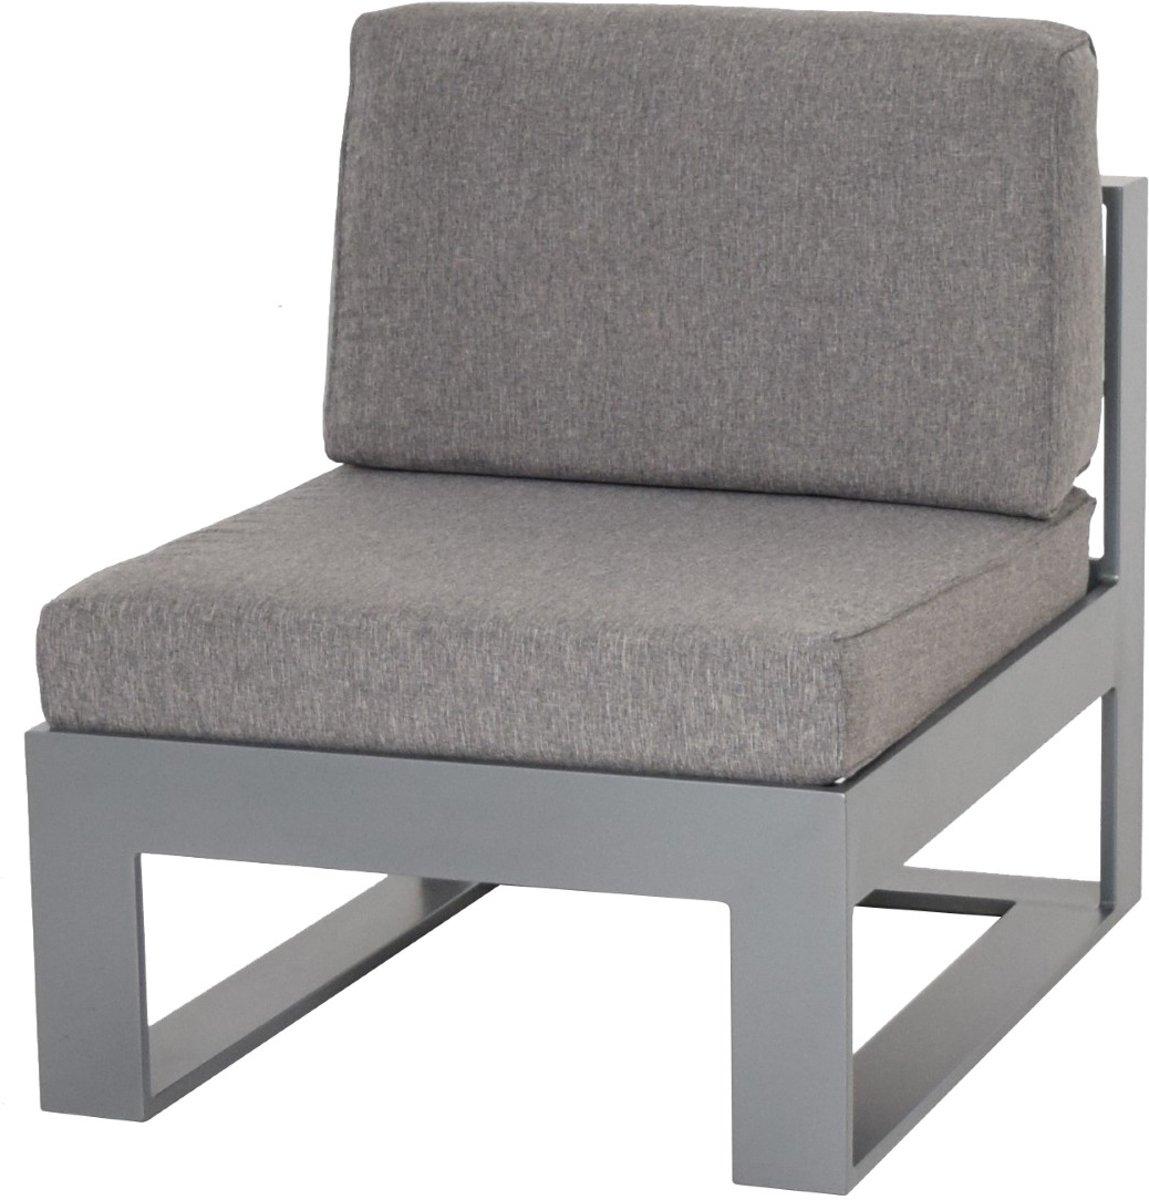 Stratos Lounge Center Grey kopen